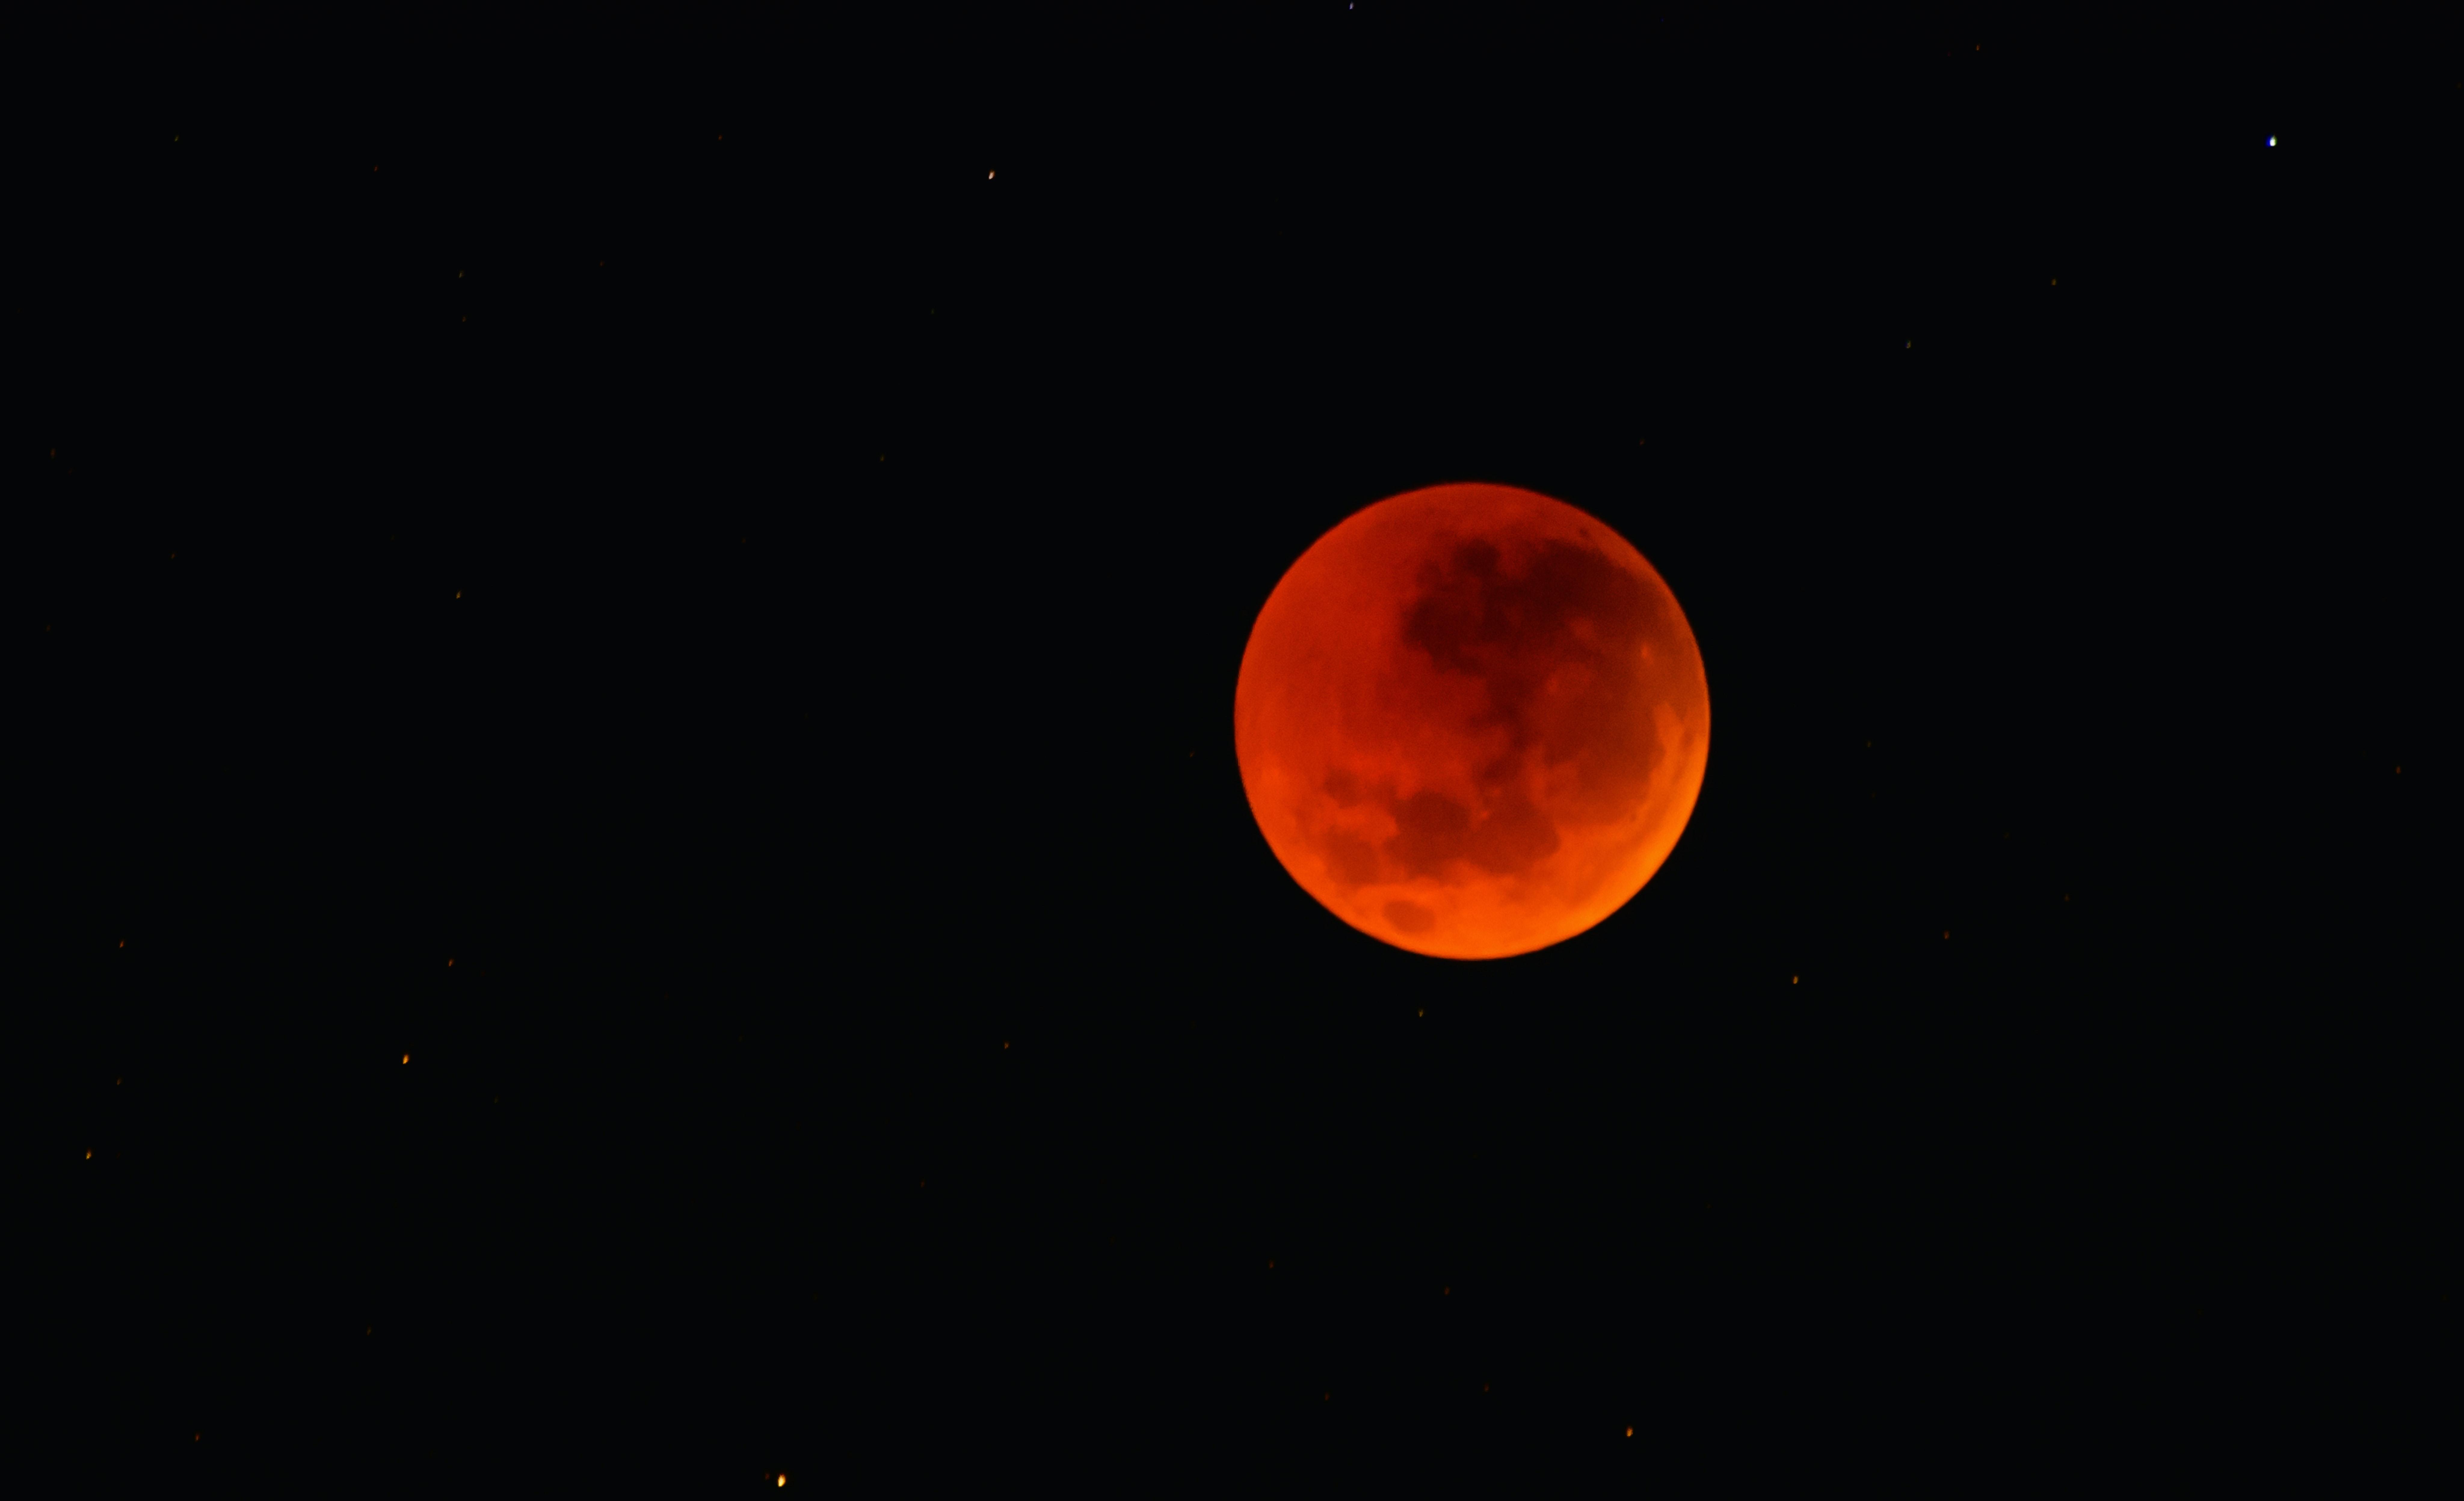 Total lunar eclipse (red moon) in black sky